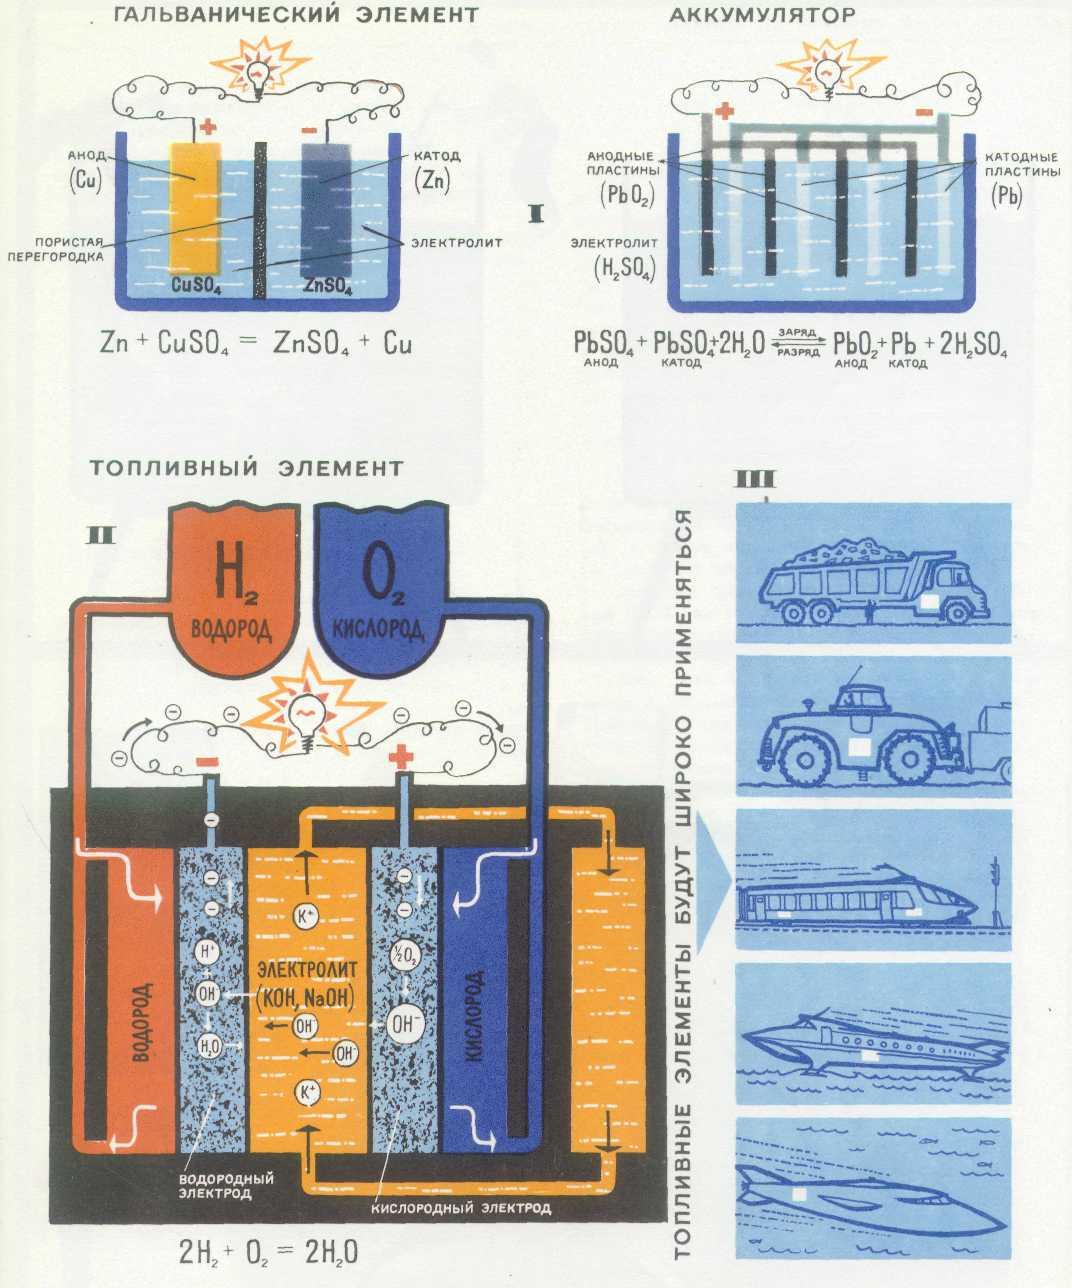 топливный элемент на водороде академика живет даче